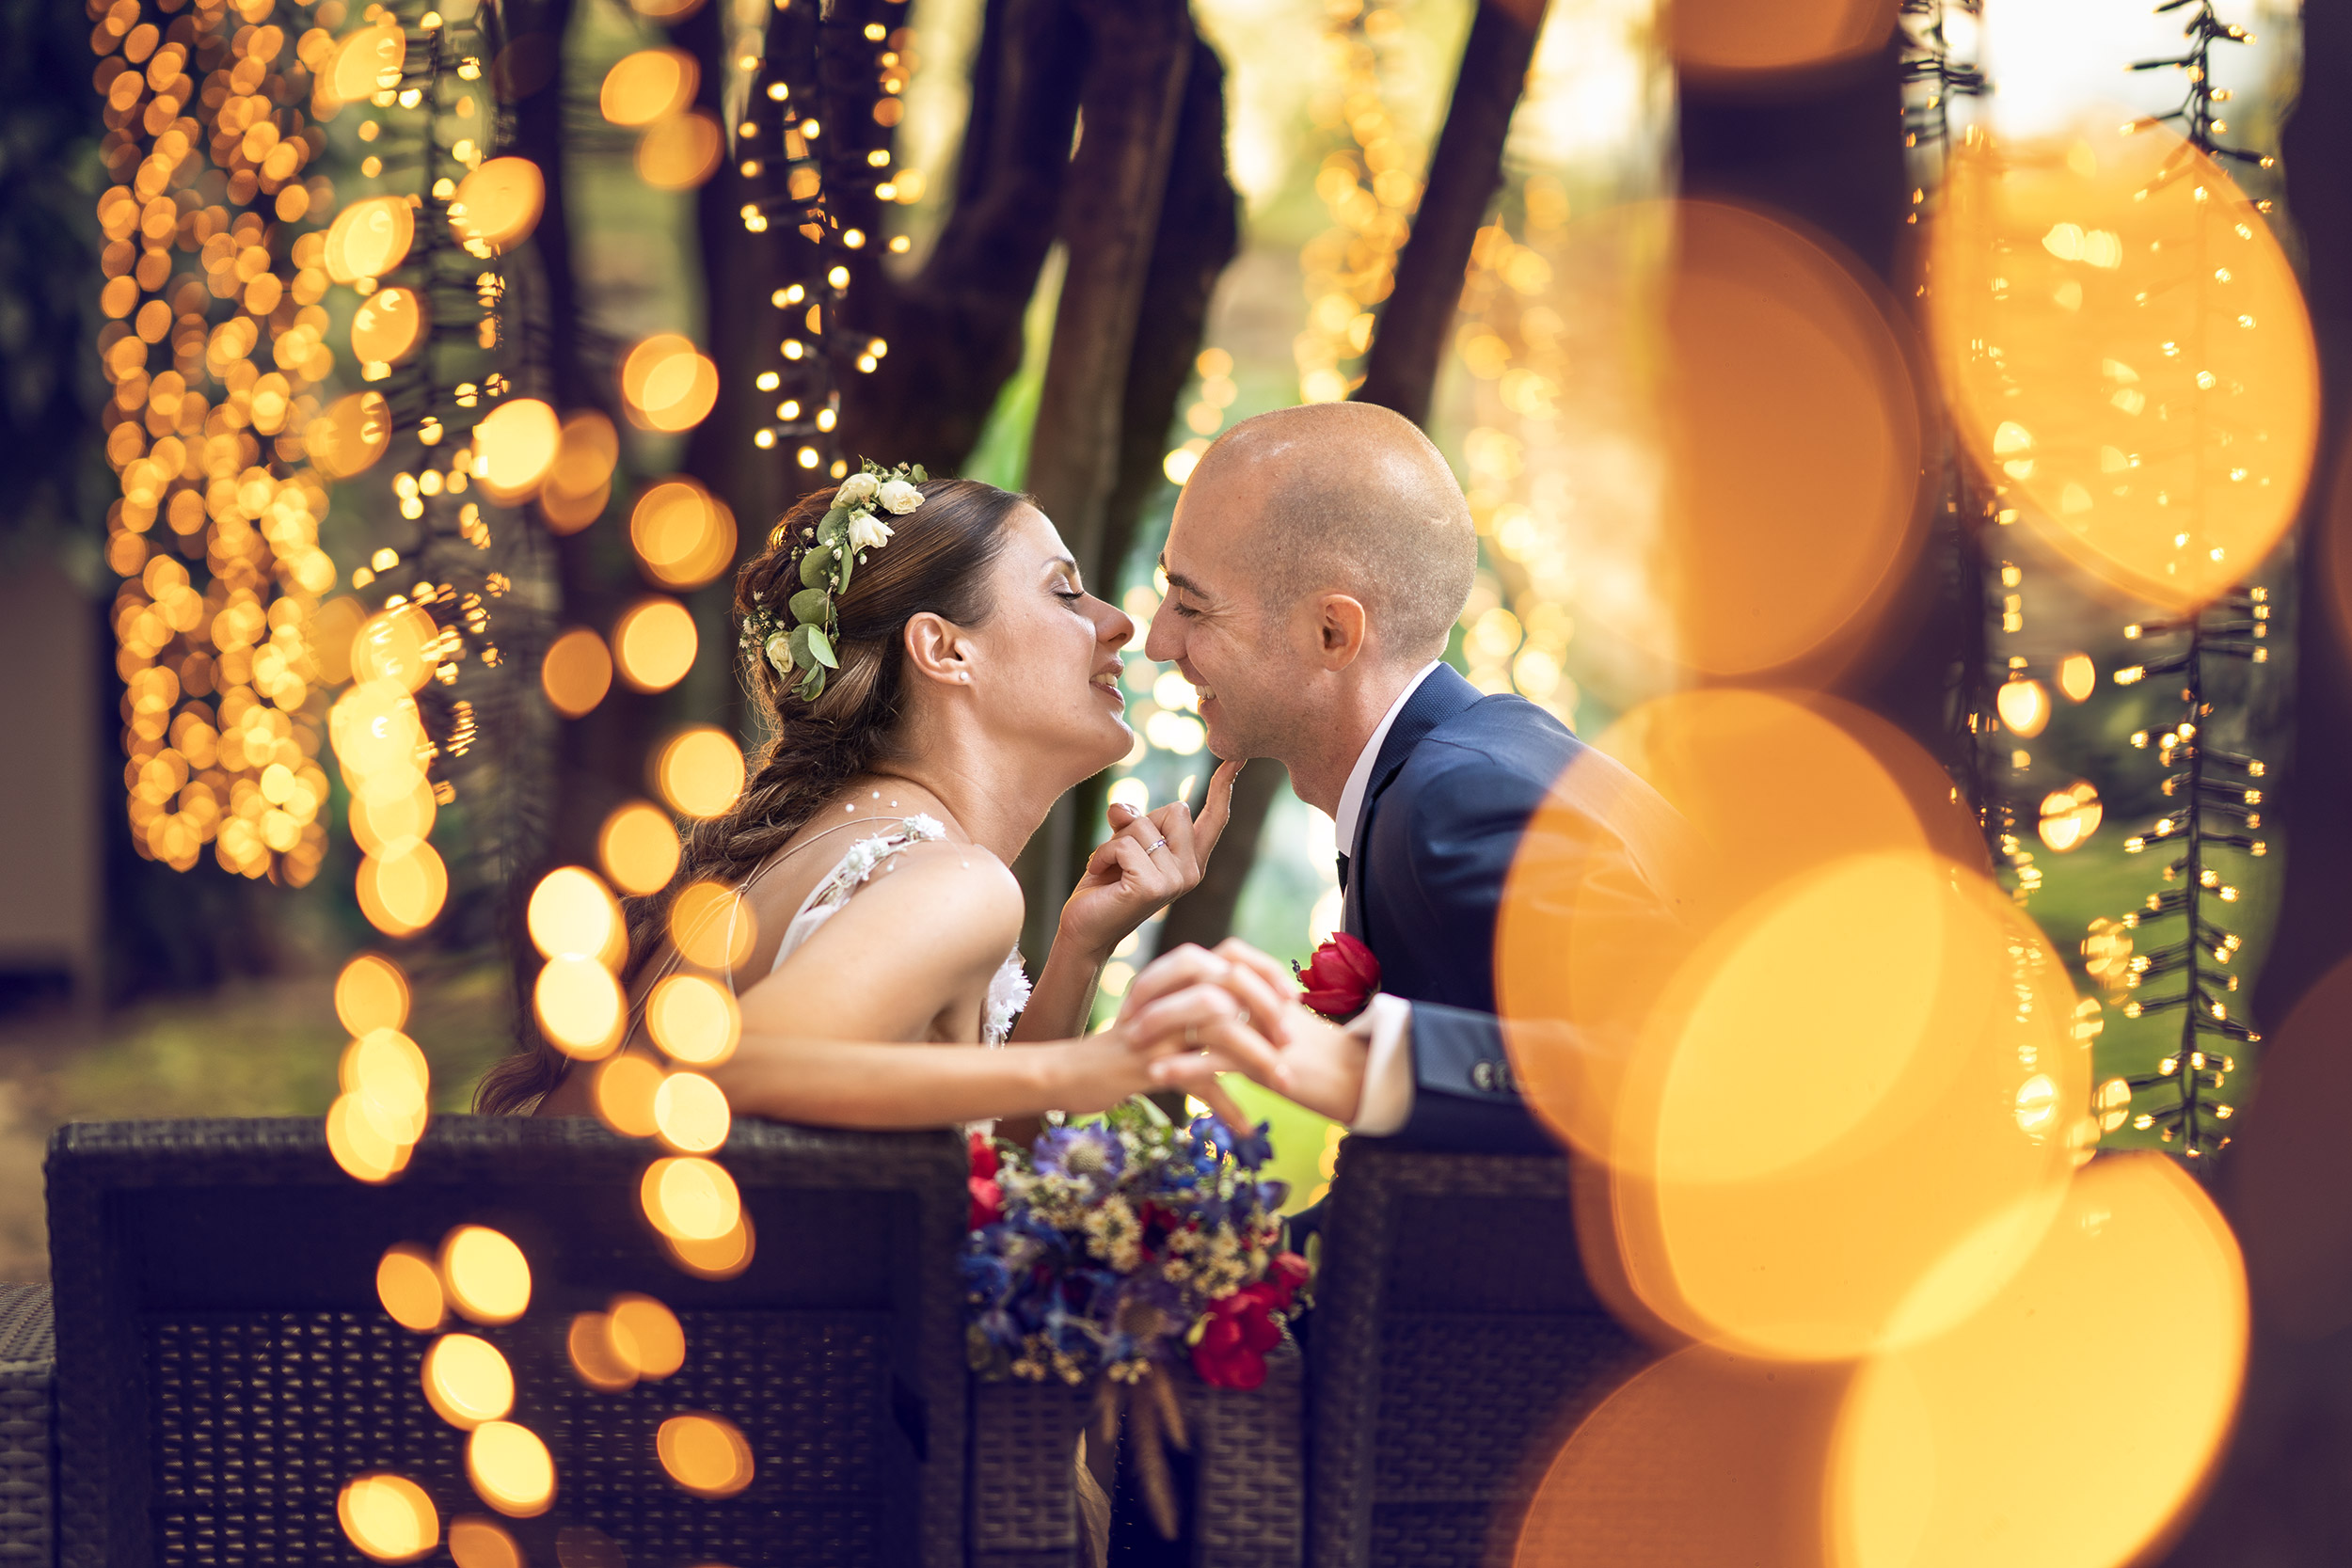 000 reportage sposi foto matrimonio wedding castello marigolda curno bergamo copia 1